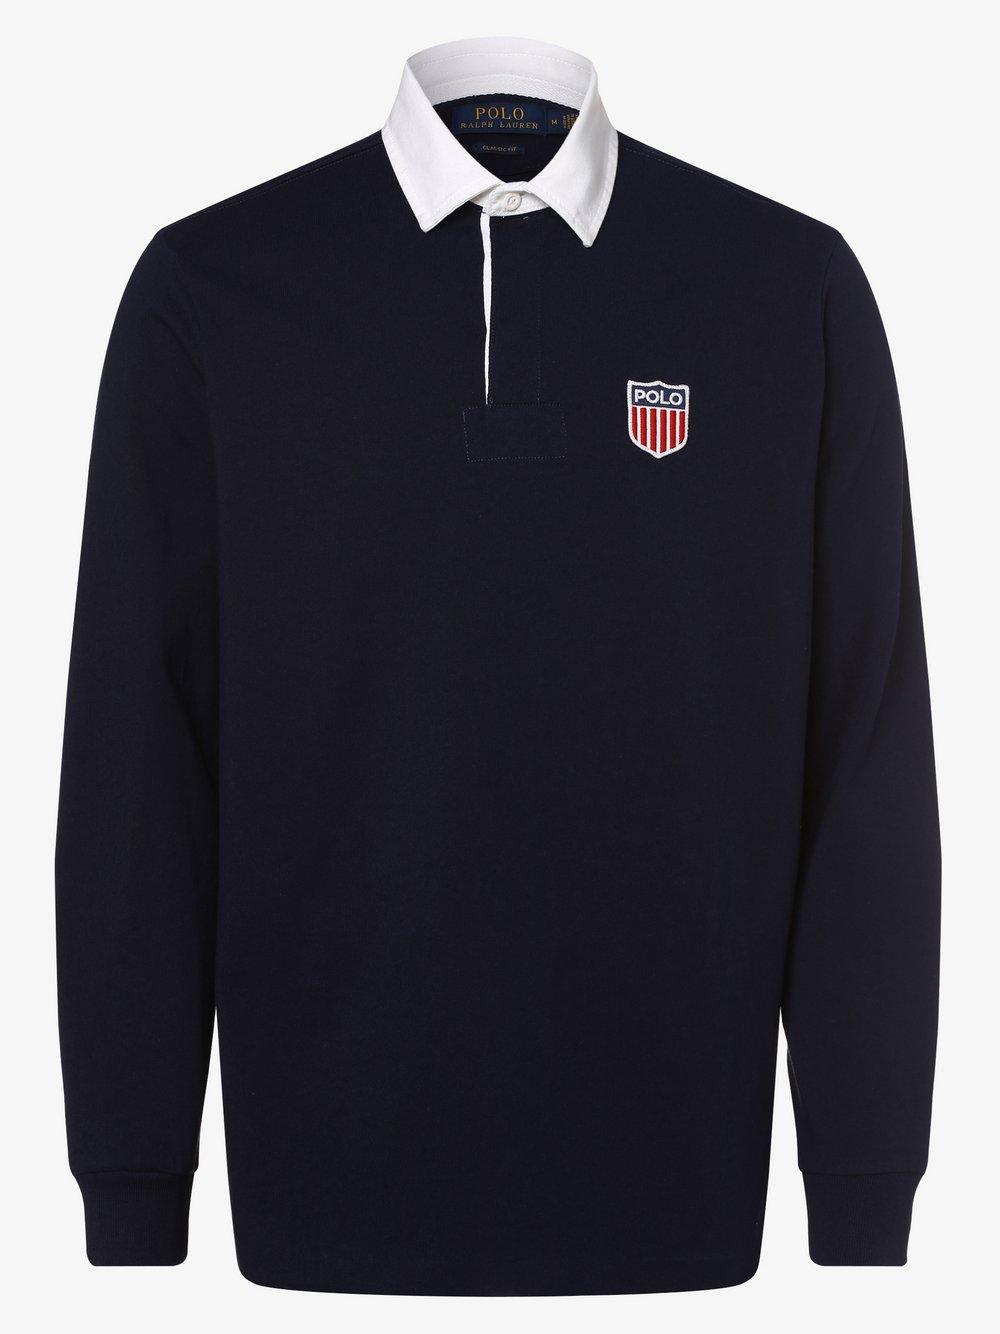 Polo Ralph Lauren - Męska bluza nierozpinana, niebieski